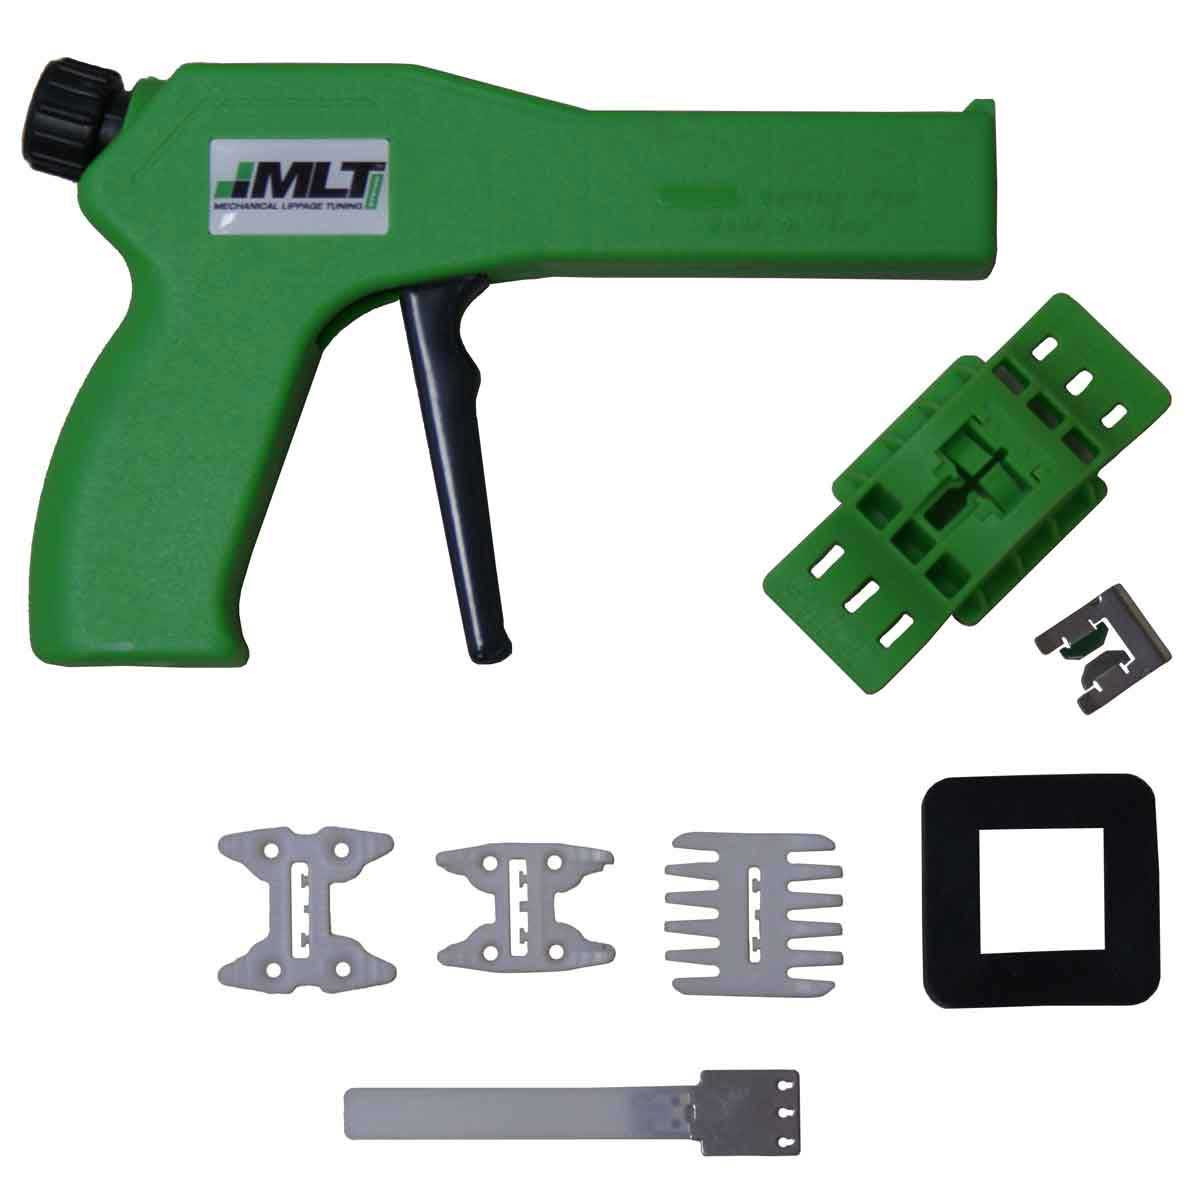 mlt ergonomic gun with kit assembly